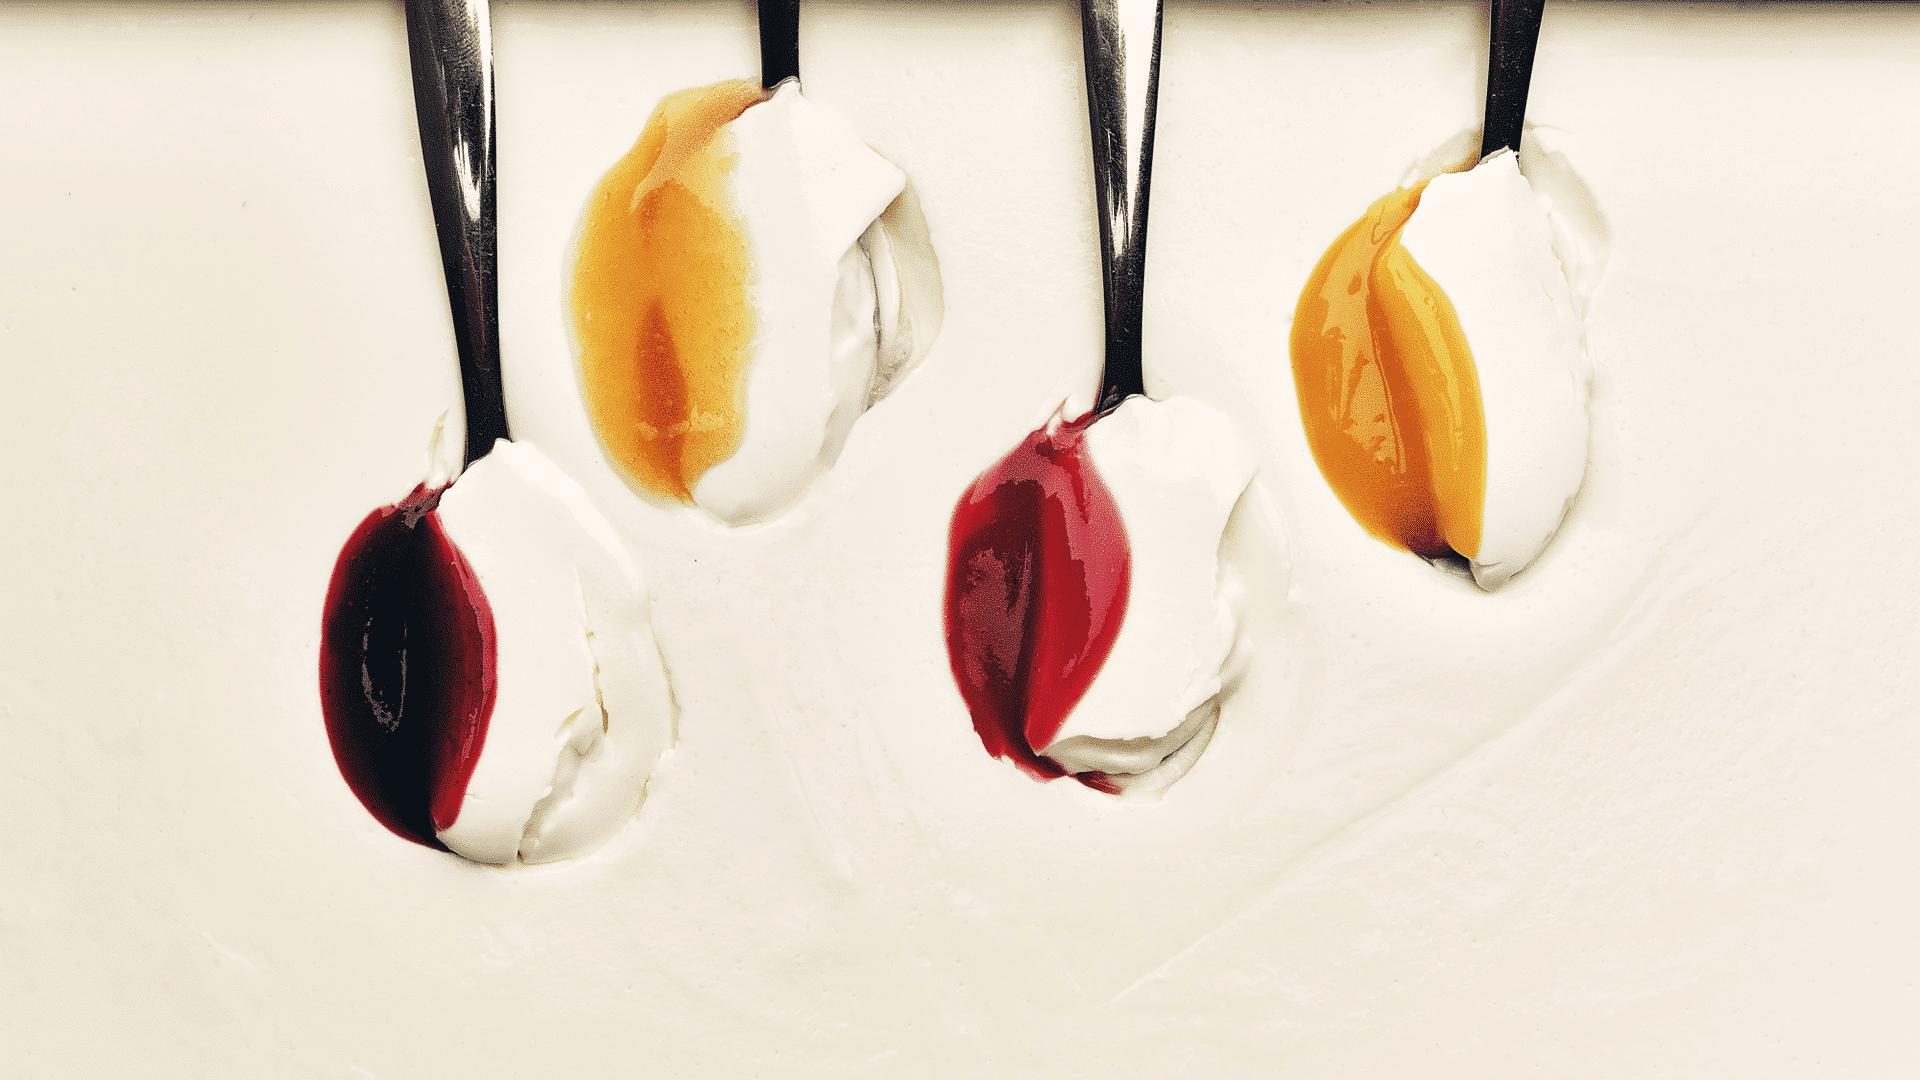 concept coulis absolu panna cotta fruit close up